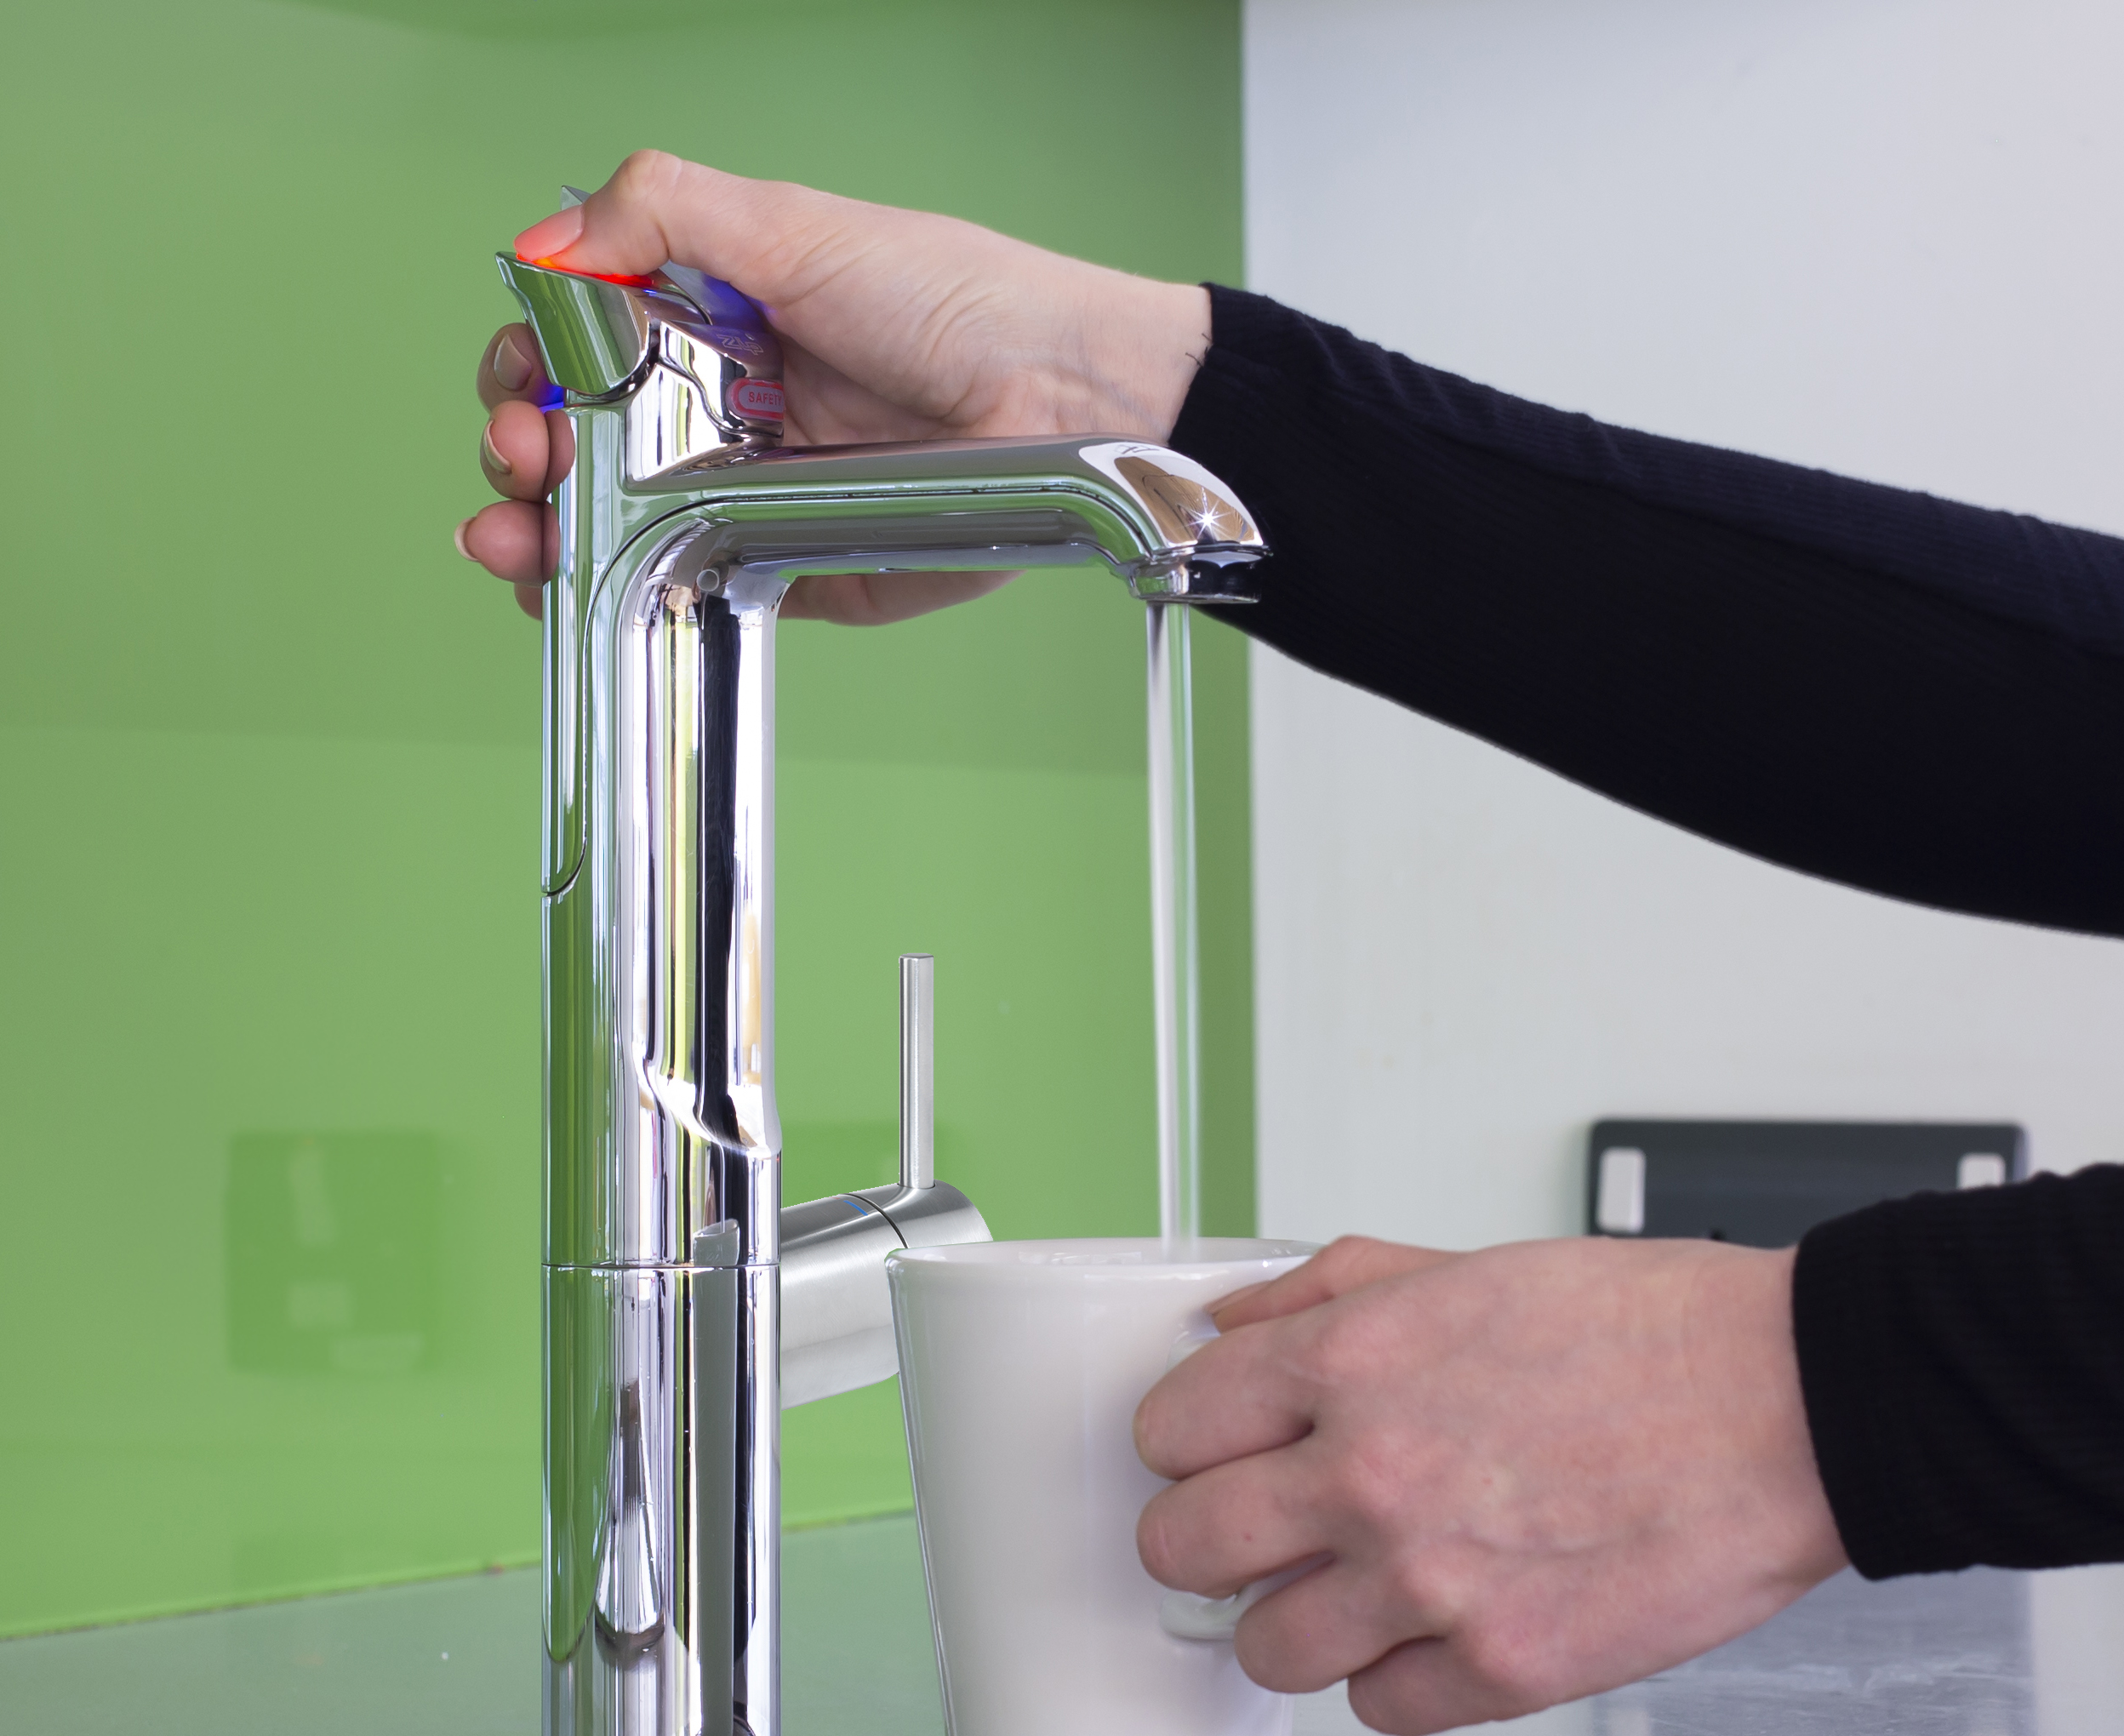 Soda Armatur Hauptarmatur Heißwasserfunktion Mit Teetasse